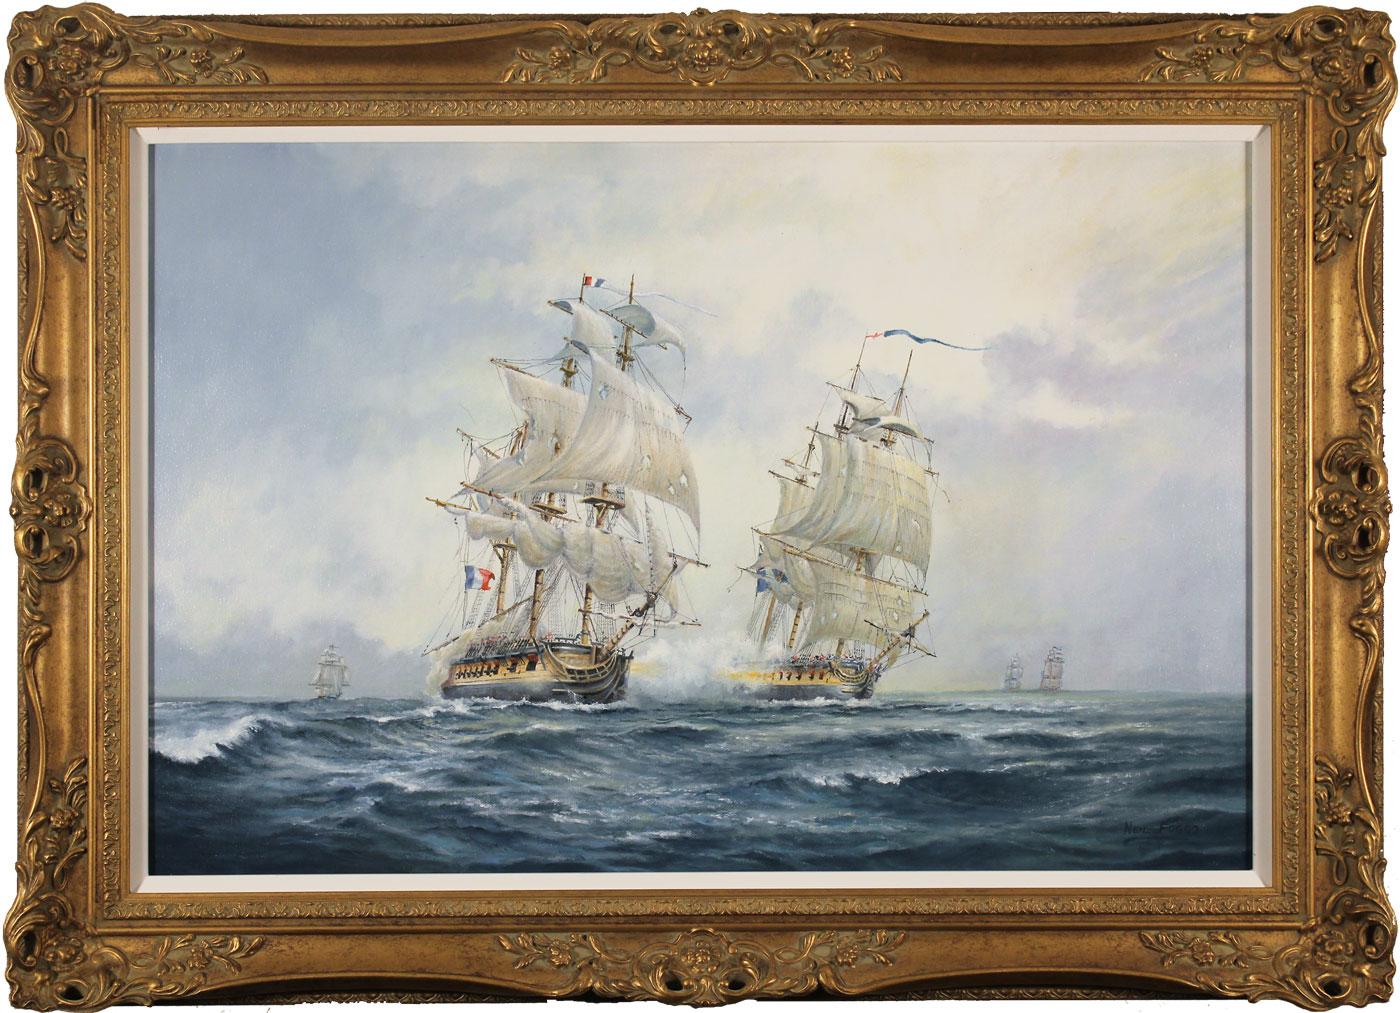 Neil Foggo, Original oil painting on canvas, A Full Broadside, click to enlarge